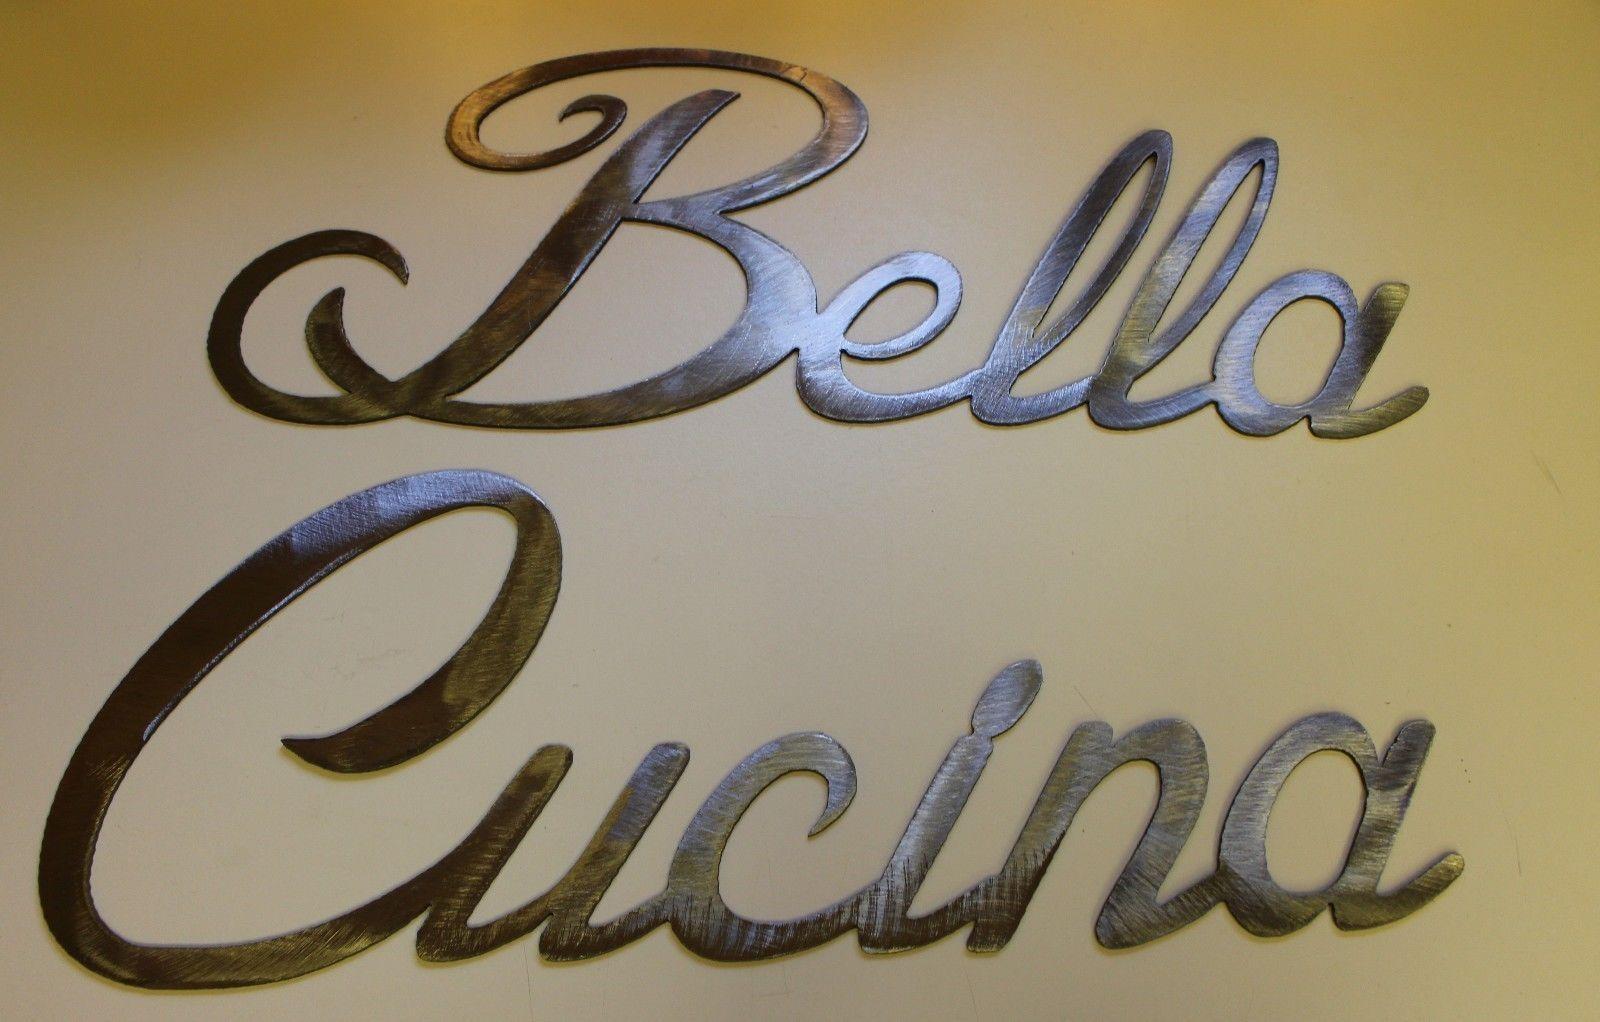 20+ Choices Of Cucina Wall Art